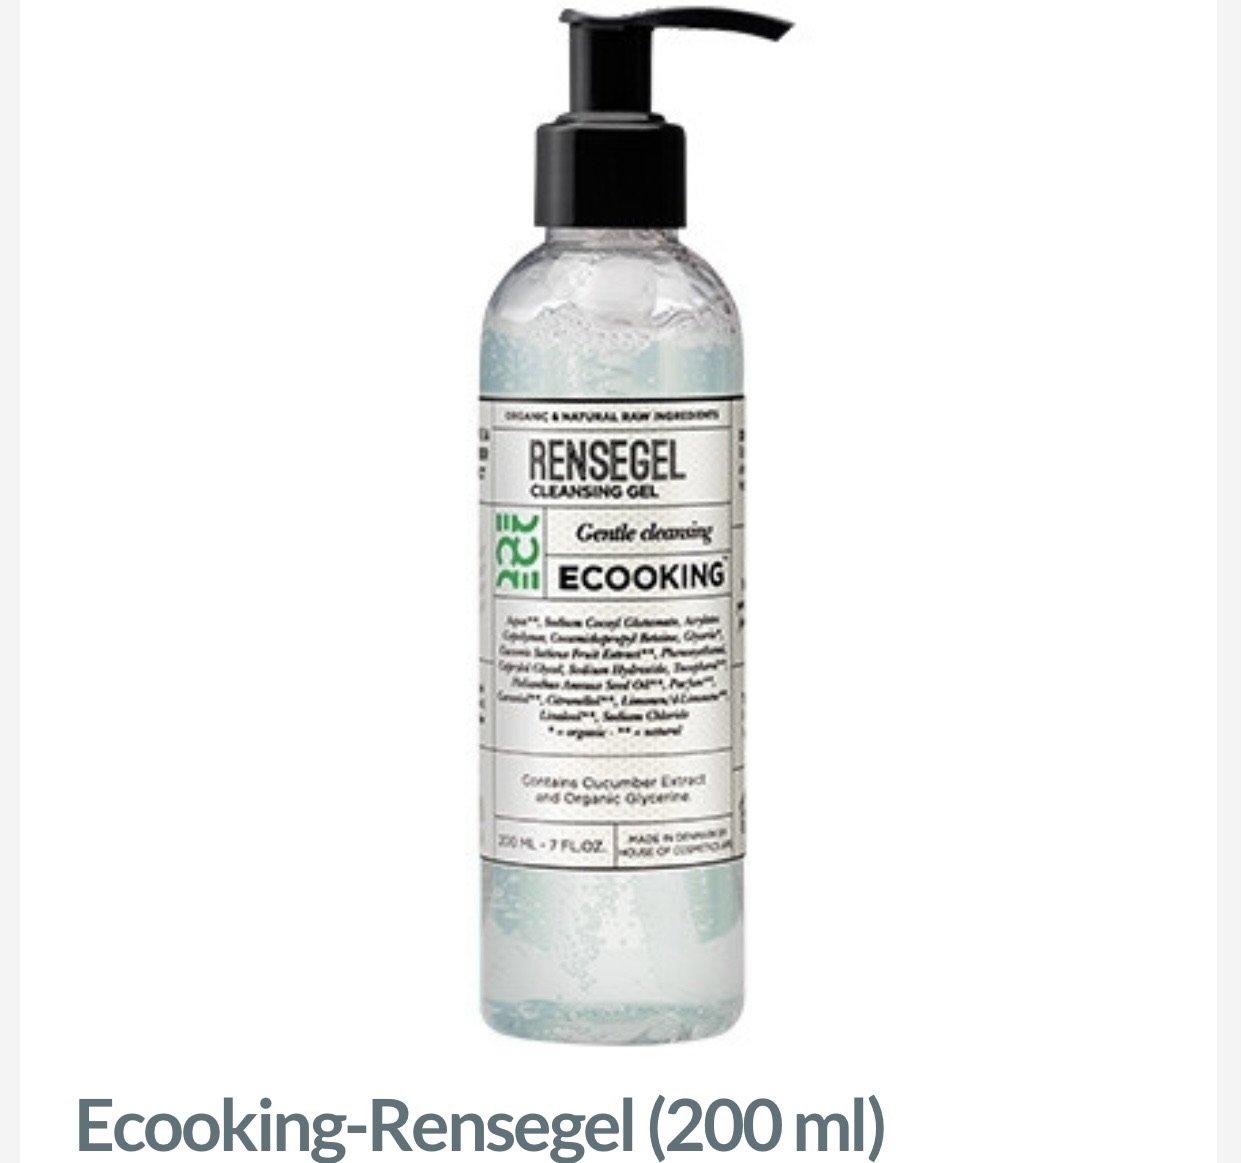 Ecooking rensegel